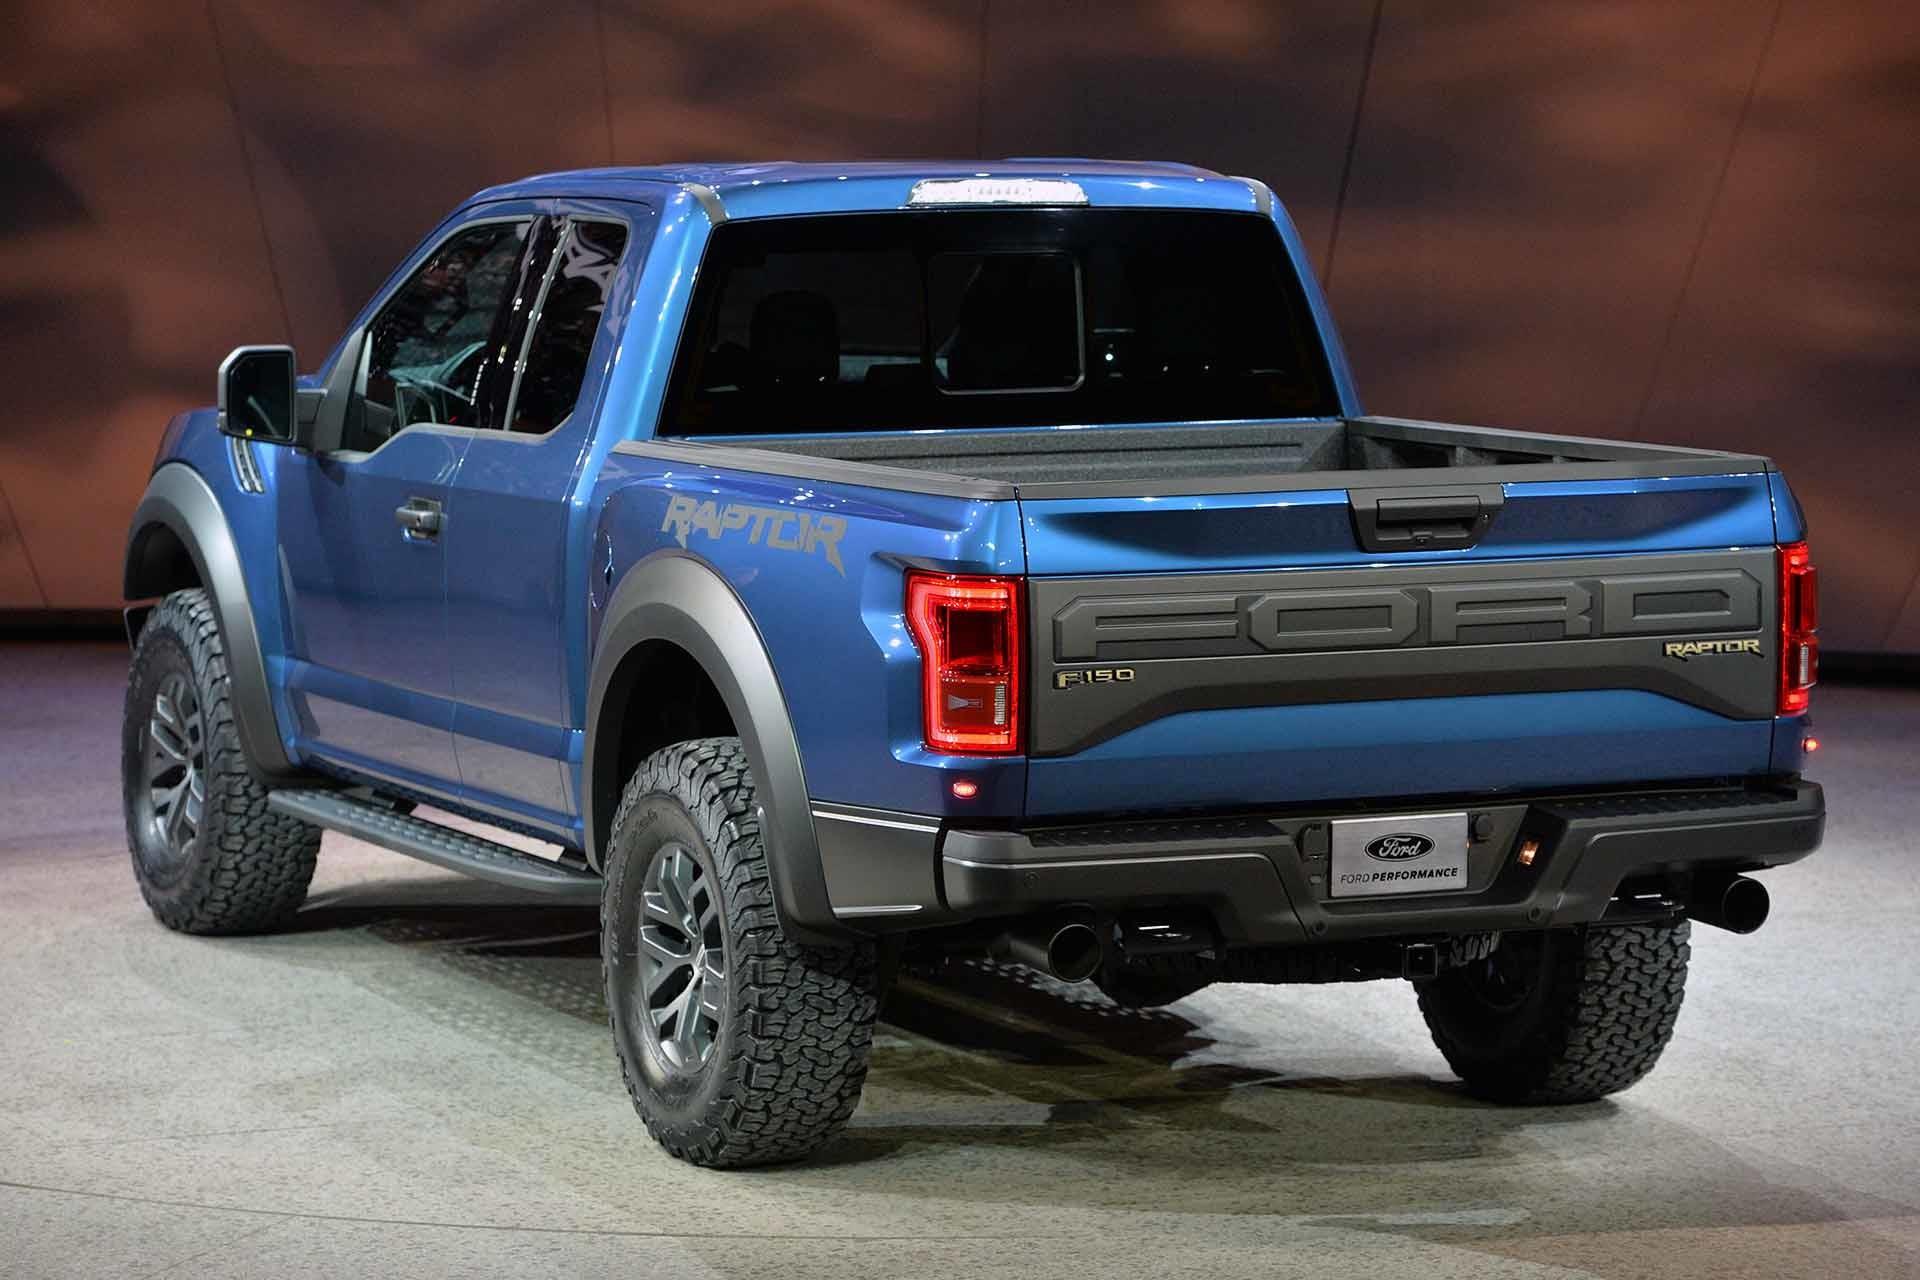 2015 Ford Raptor Desktop HD Wallpapers